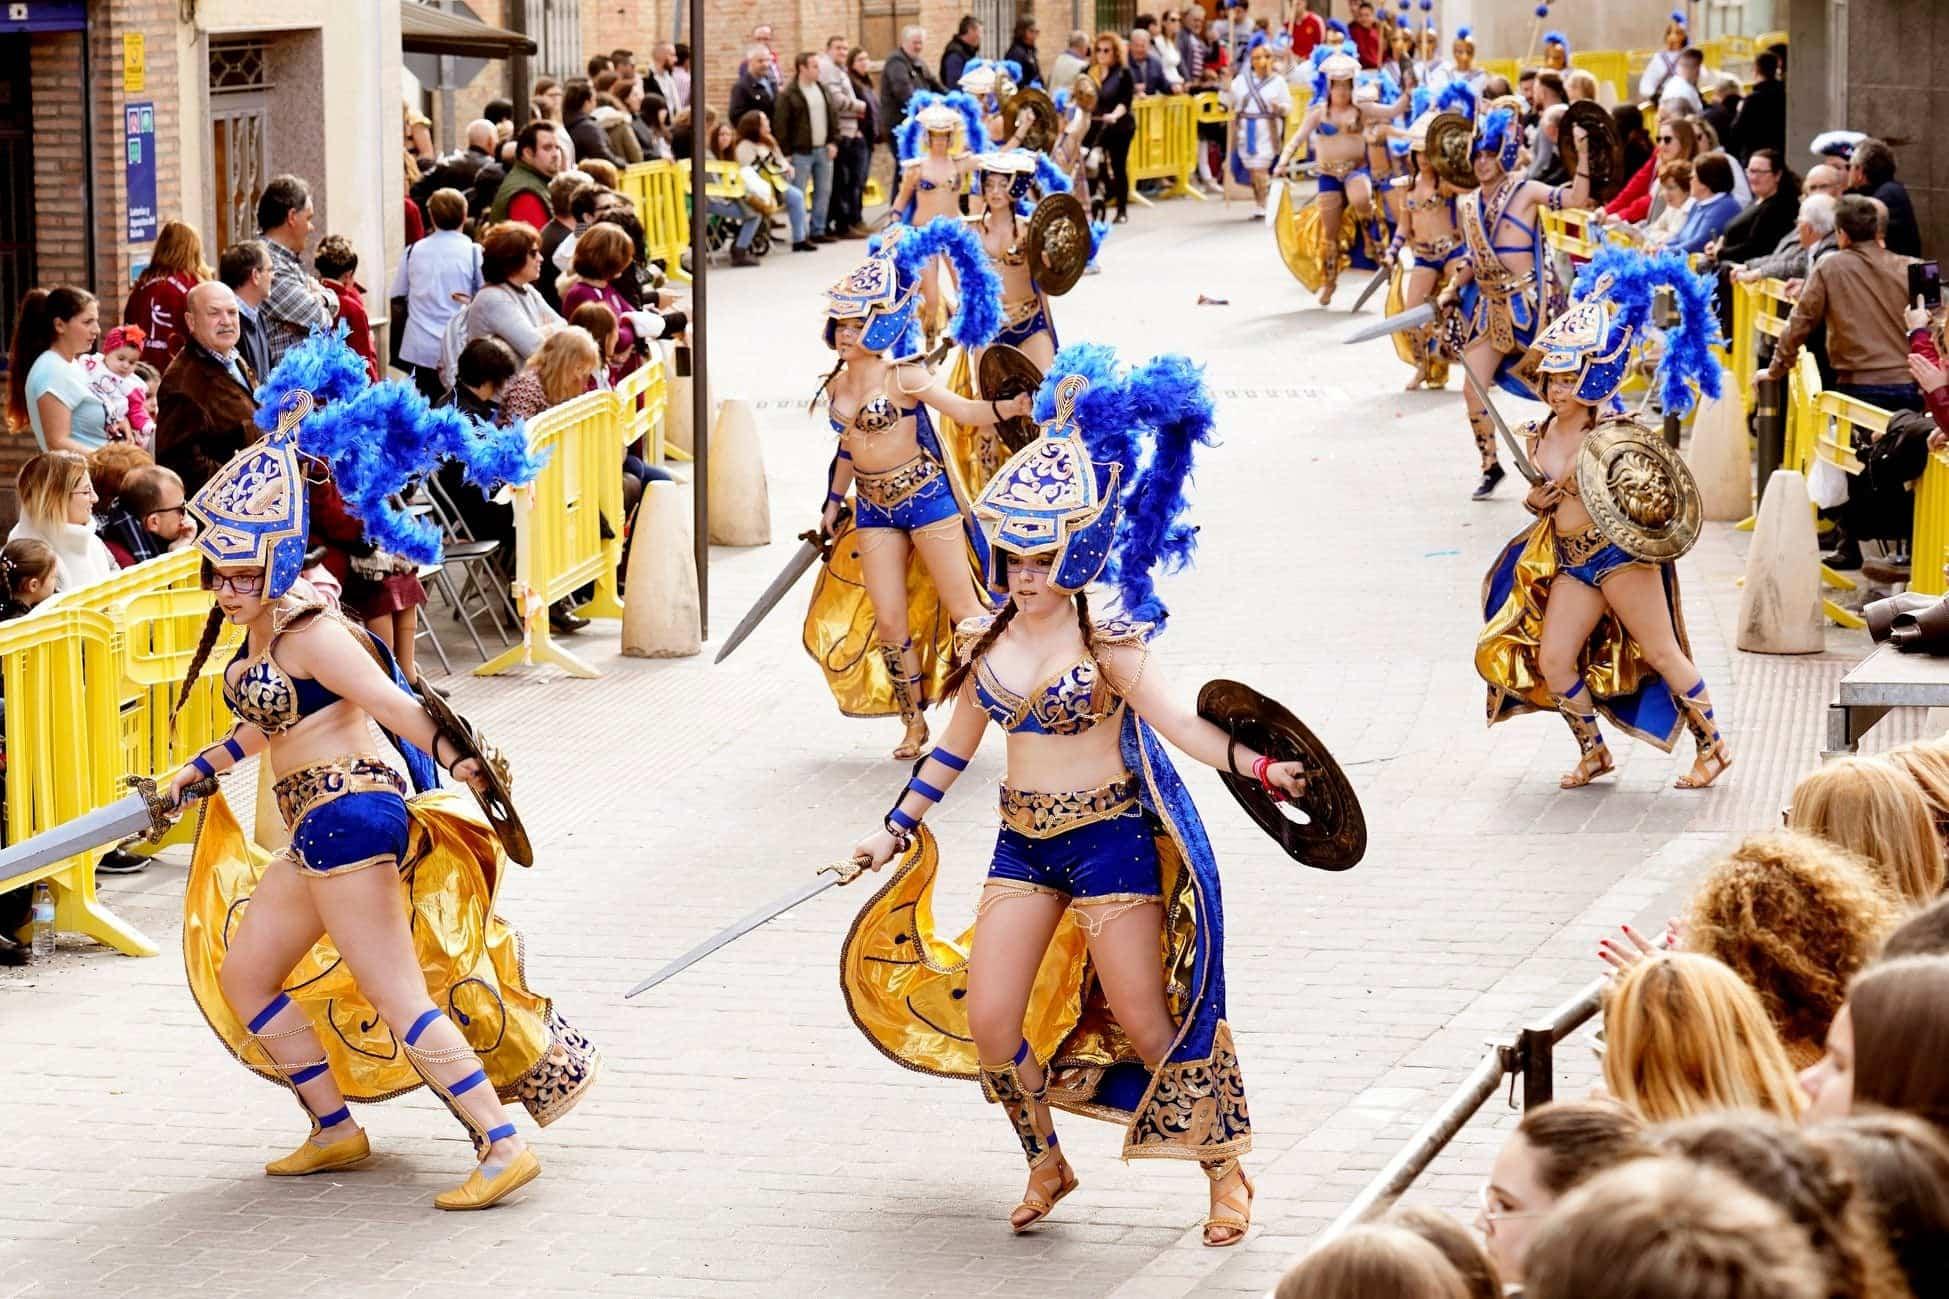 Carnaval de herencia 2020 ofertorio 111 - Selección de fotografías del Ofertorio del Carnaval de Herencia